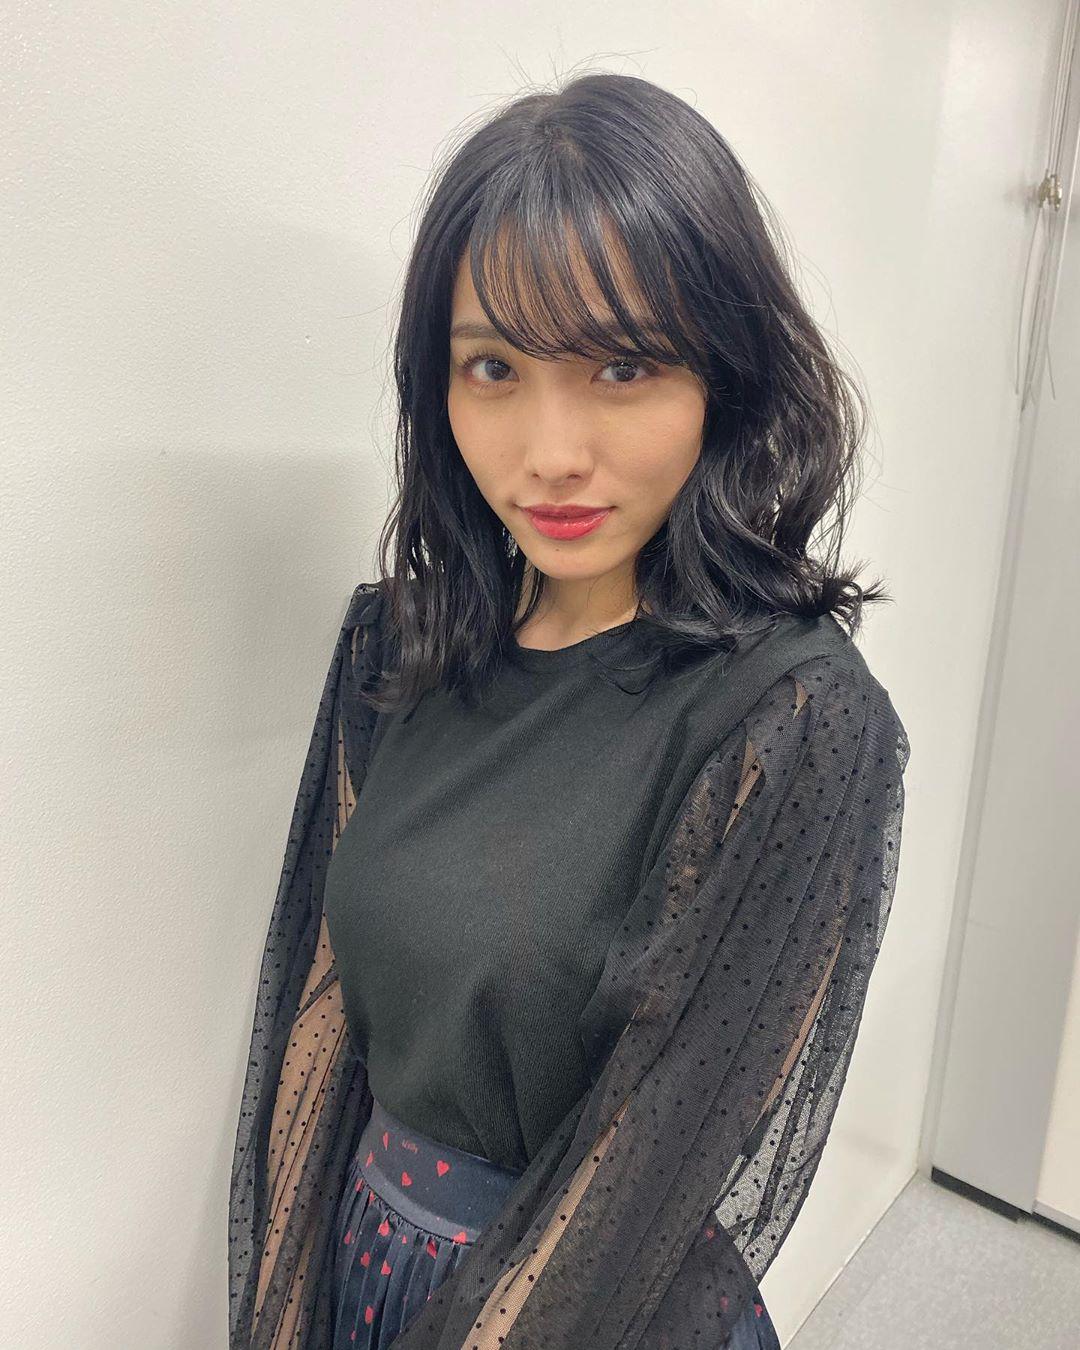 konno_anna183.jpg